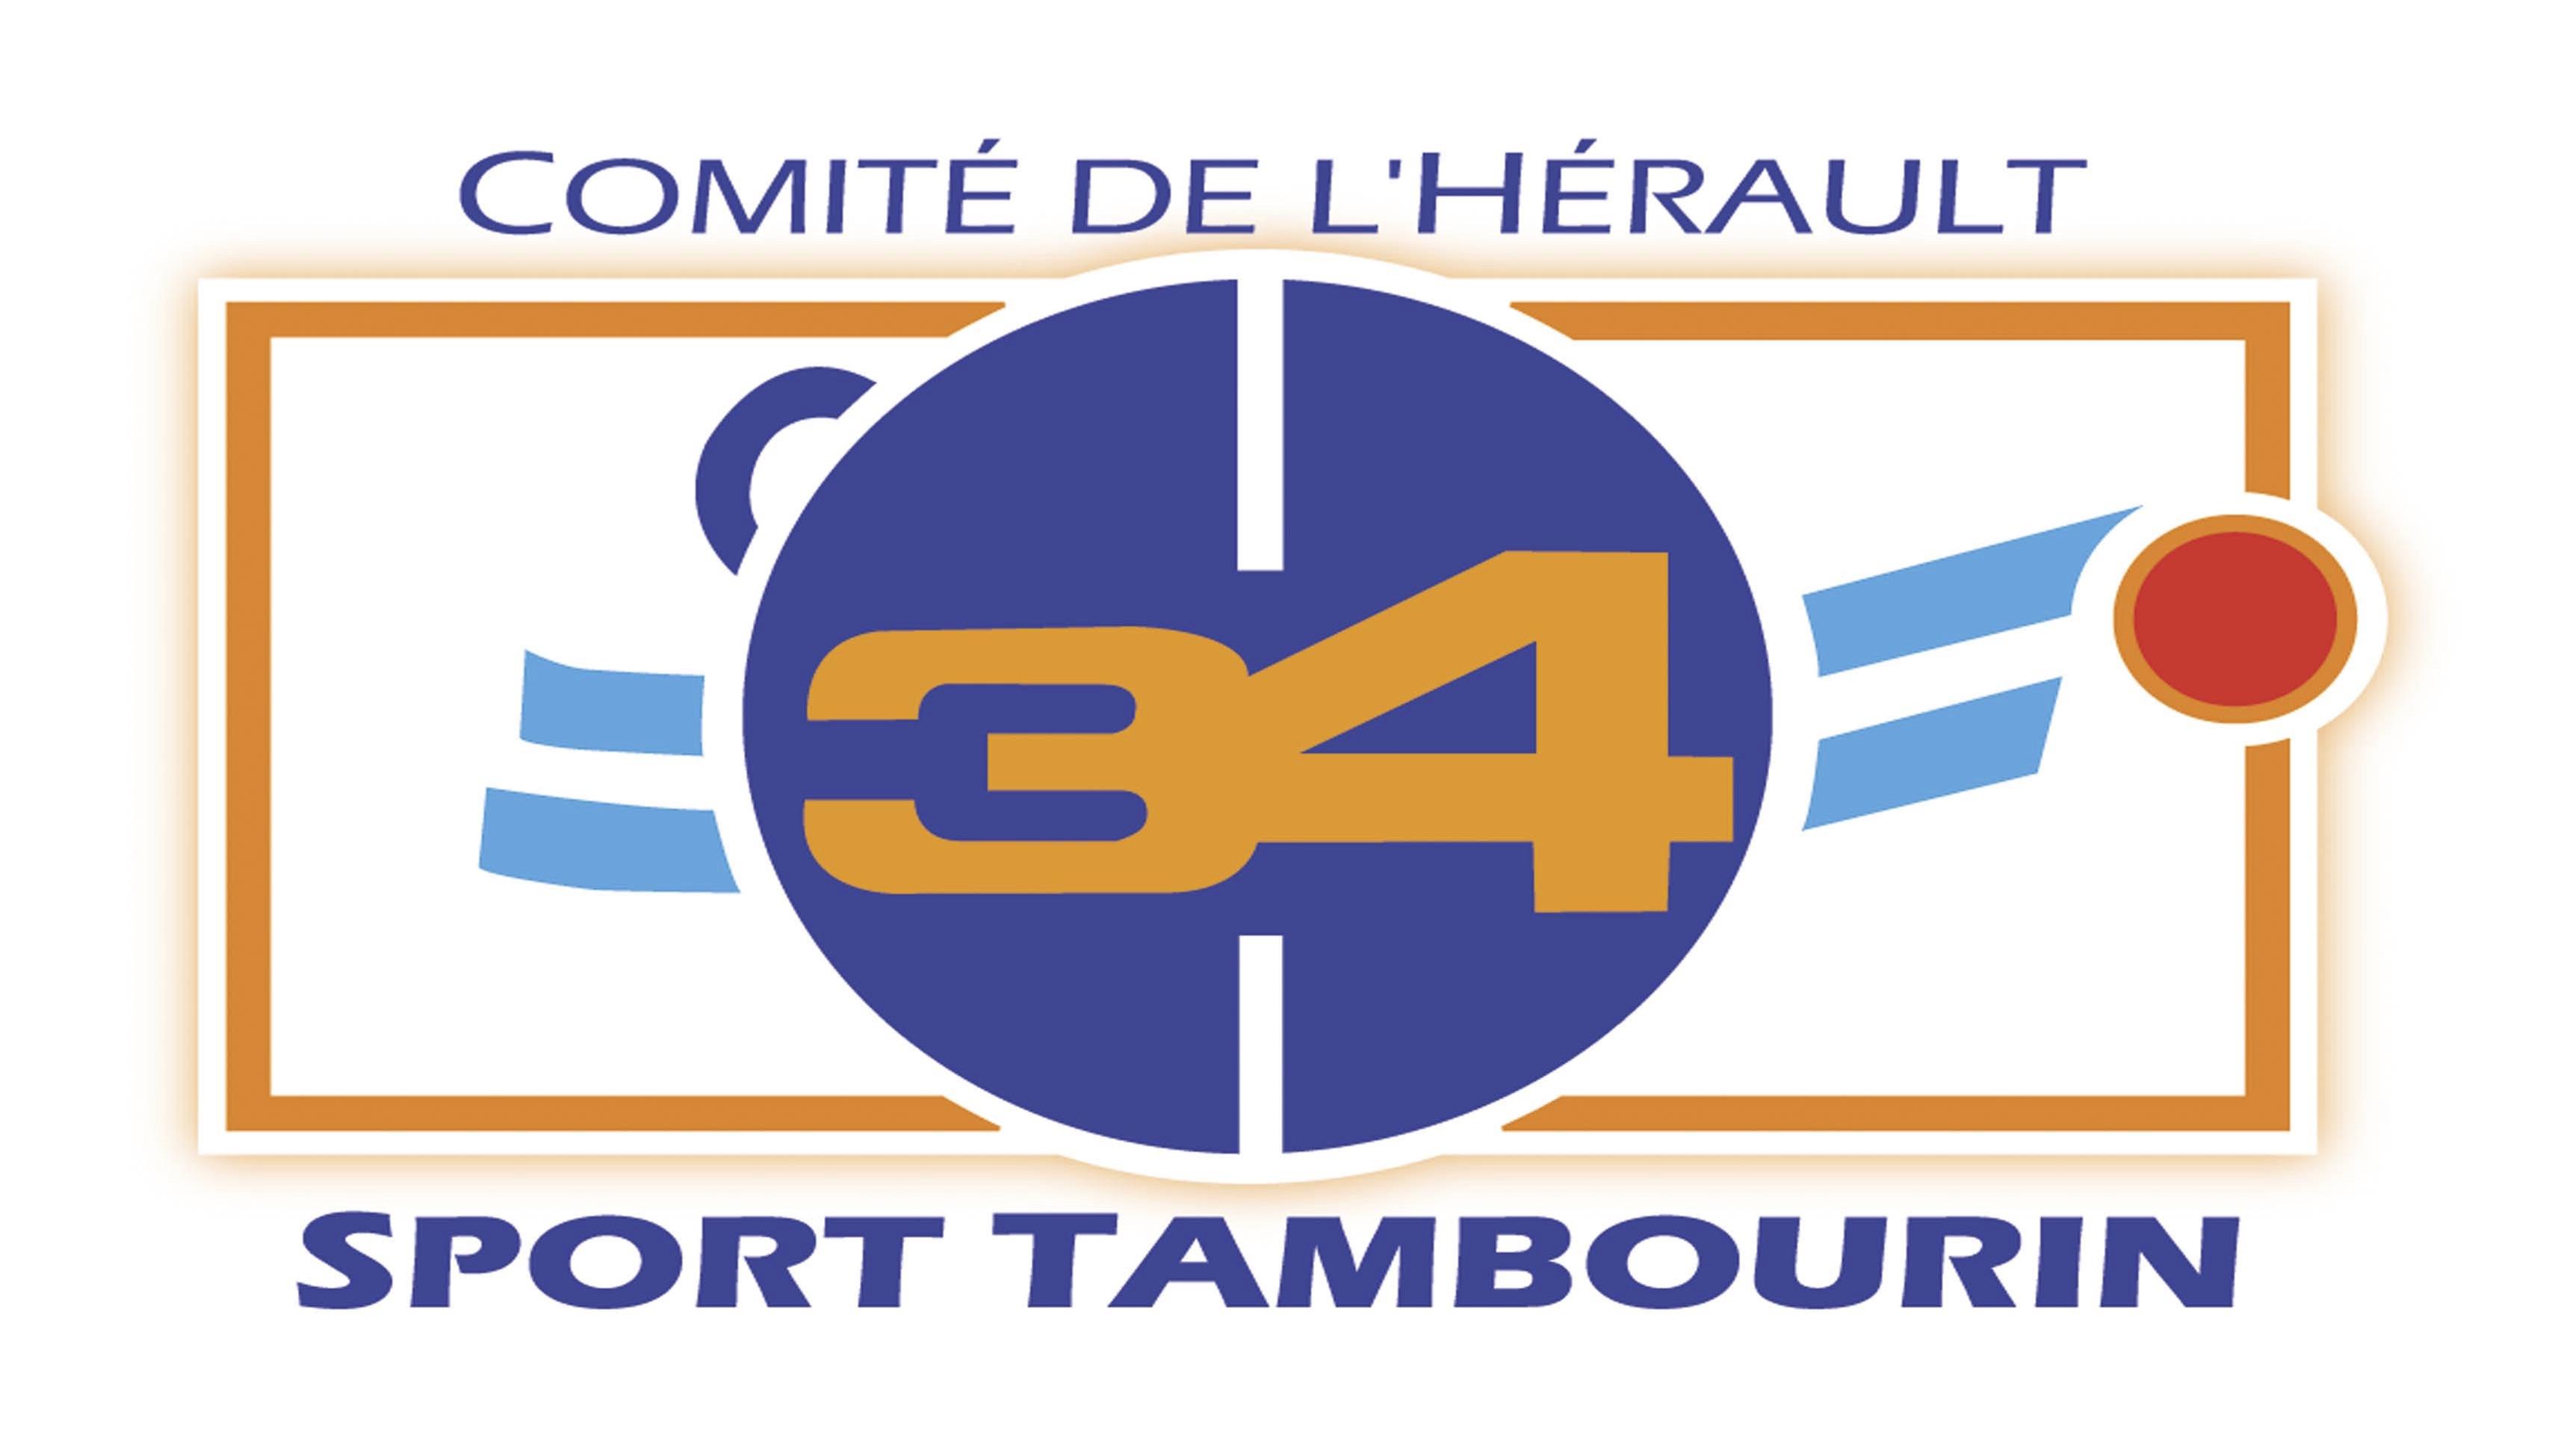 Comité de l'hérault Sport tambourin